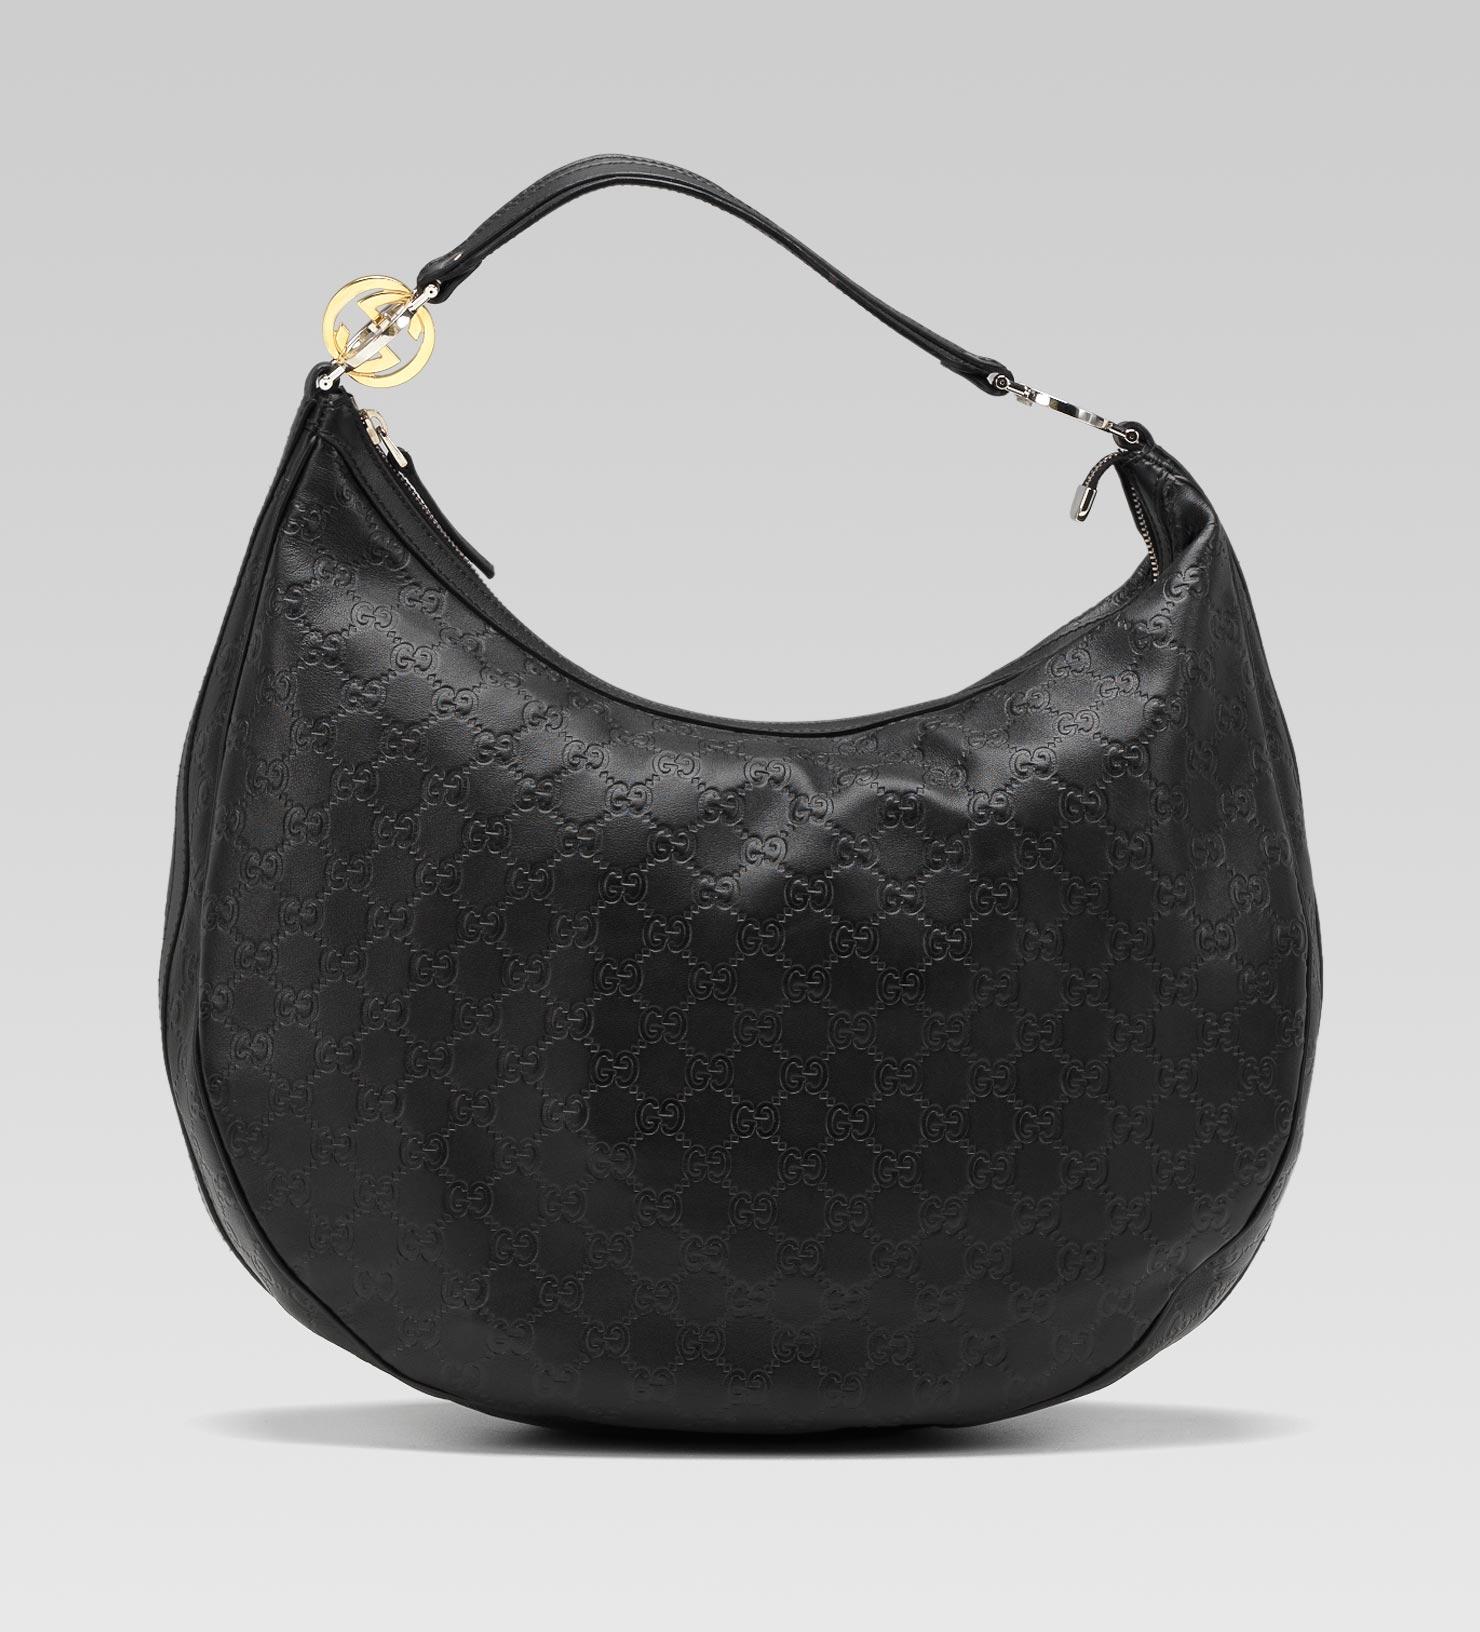 3a92bcf95 Gucci Guccissima Leather Large Joy Hobo Bag